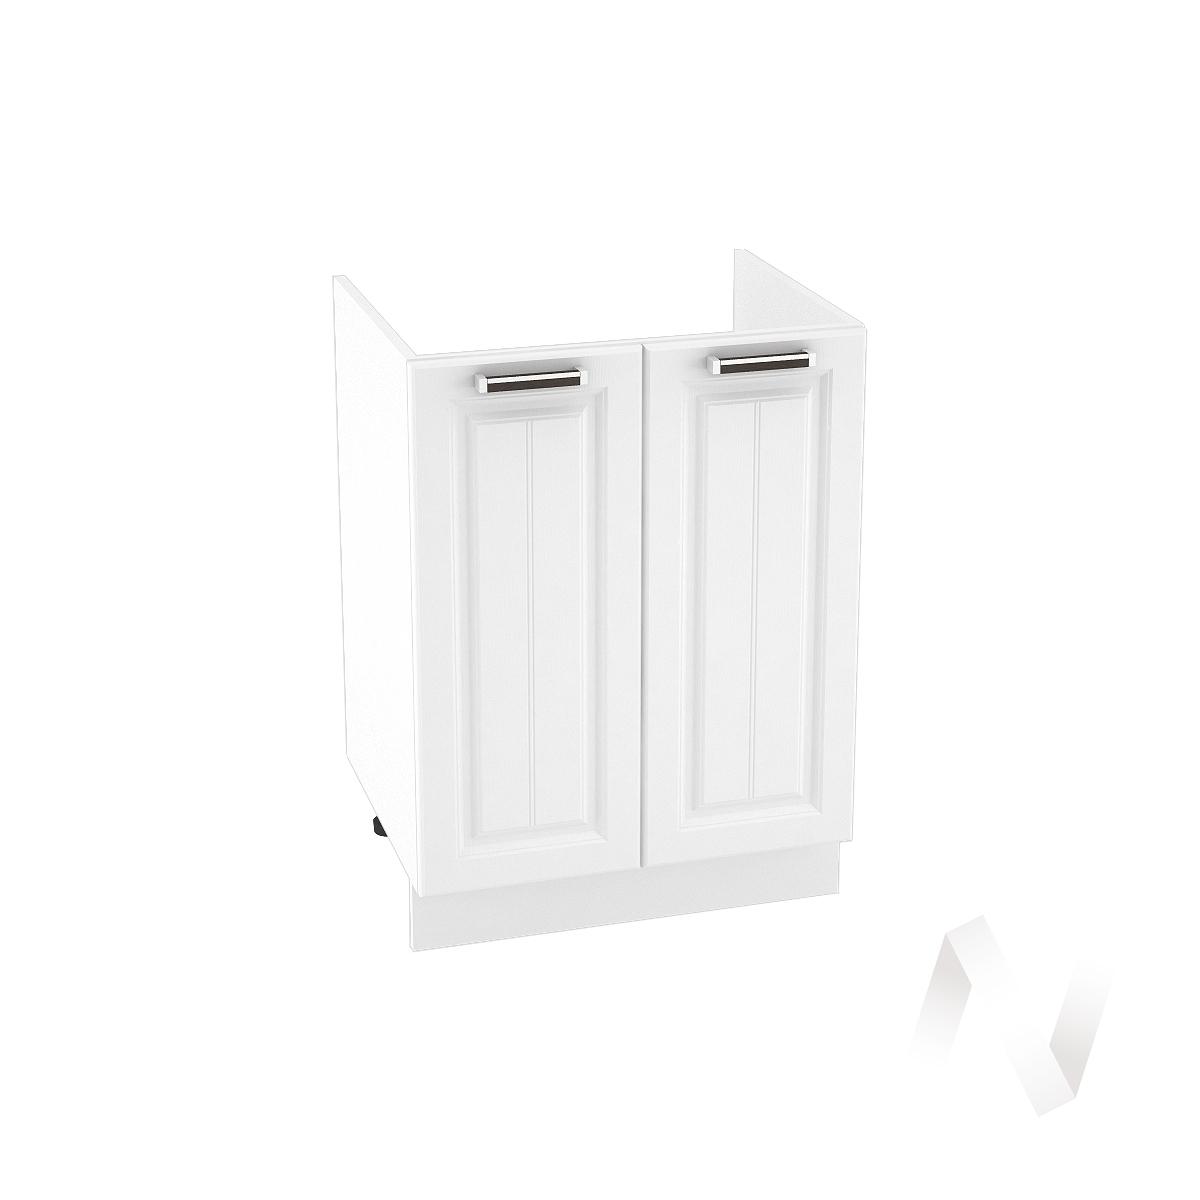 "Кухня ""Прага"": Шкаф нижний под мойку 600, ШНМ 600 (белое дерево/корпус белый)"